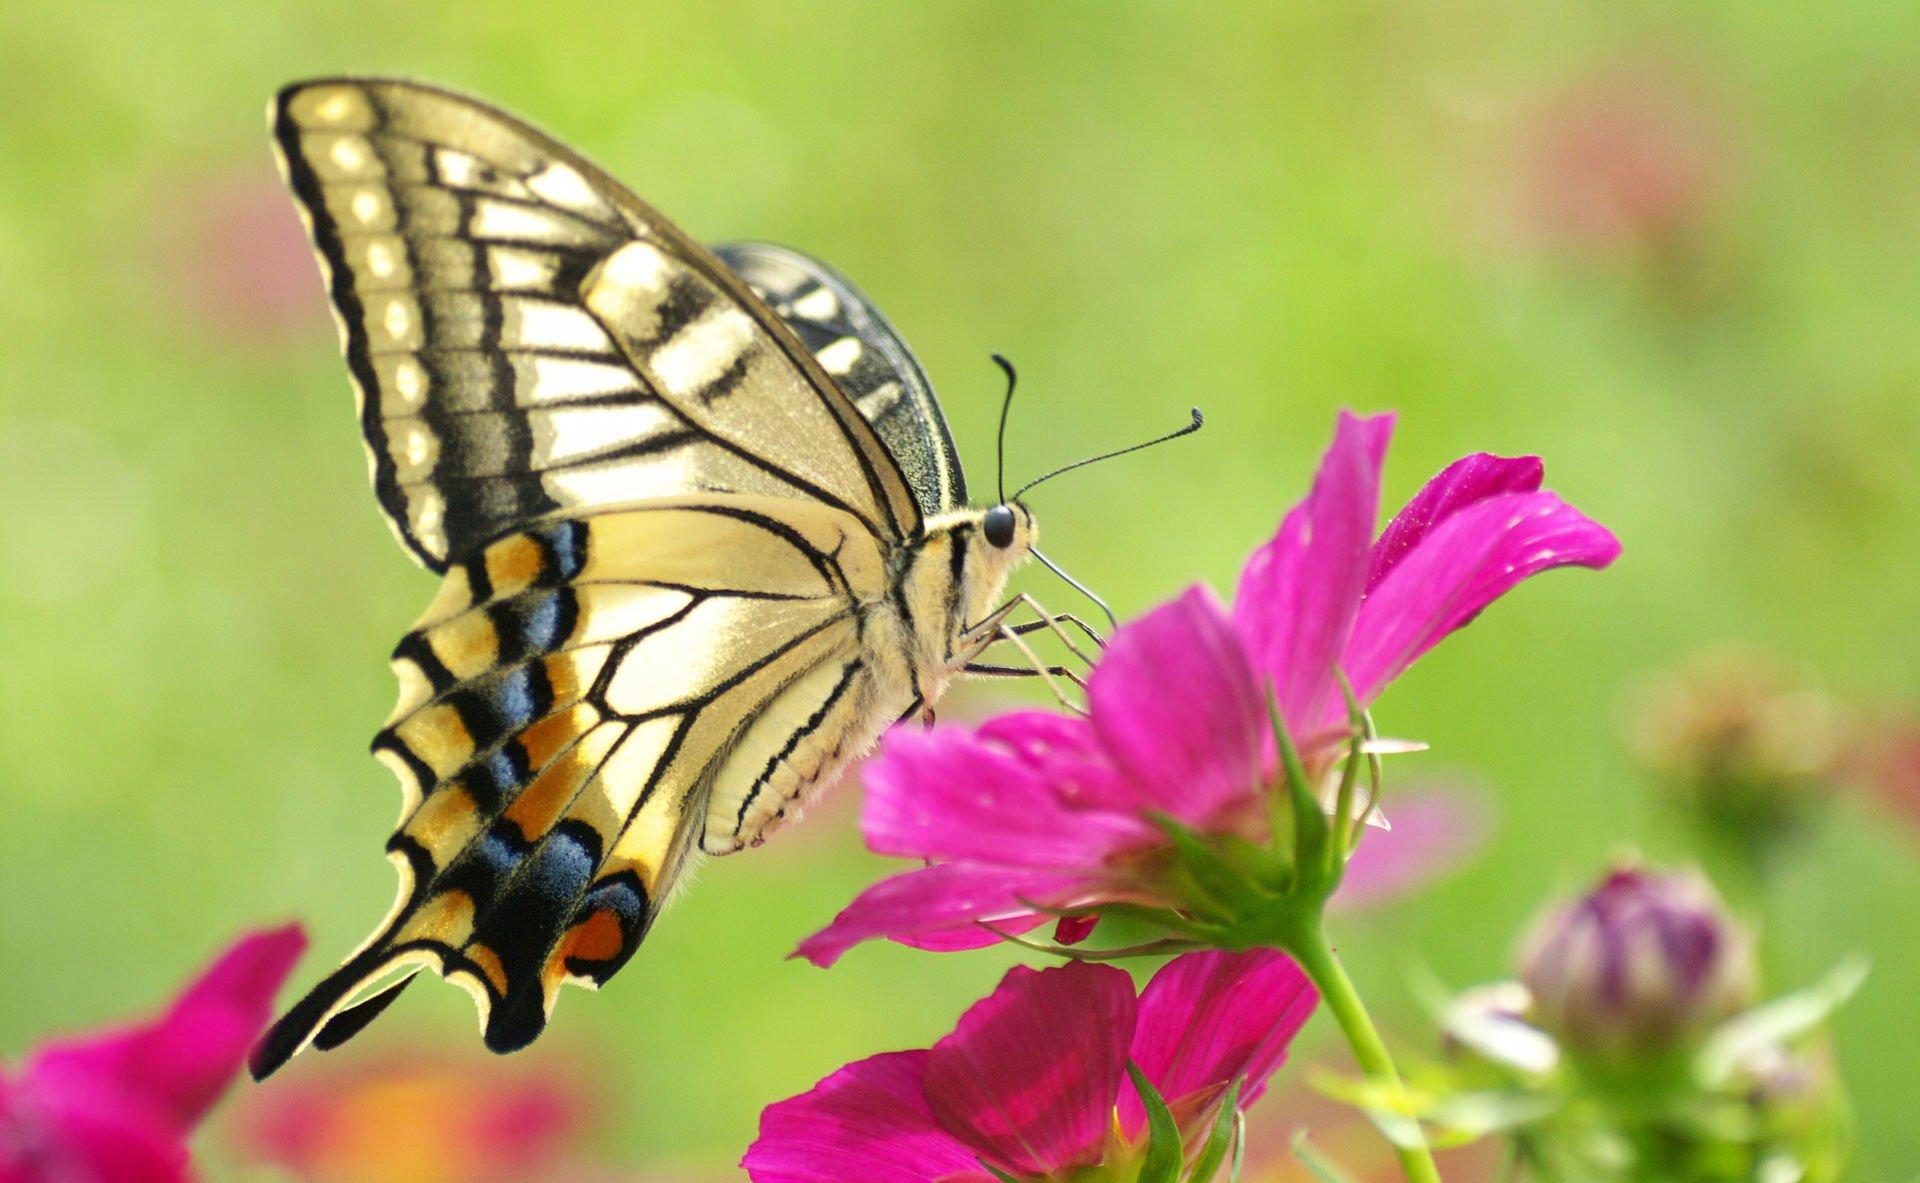 Обои мир бабочек, красота, цветок. Макро foto 9